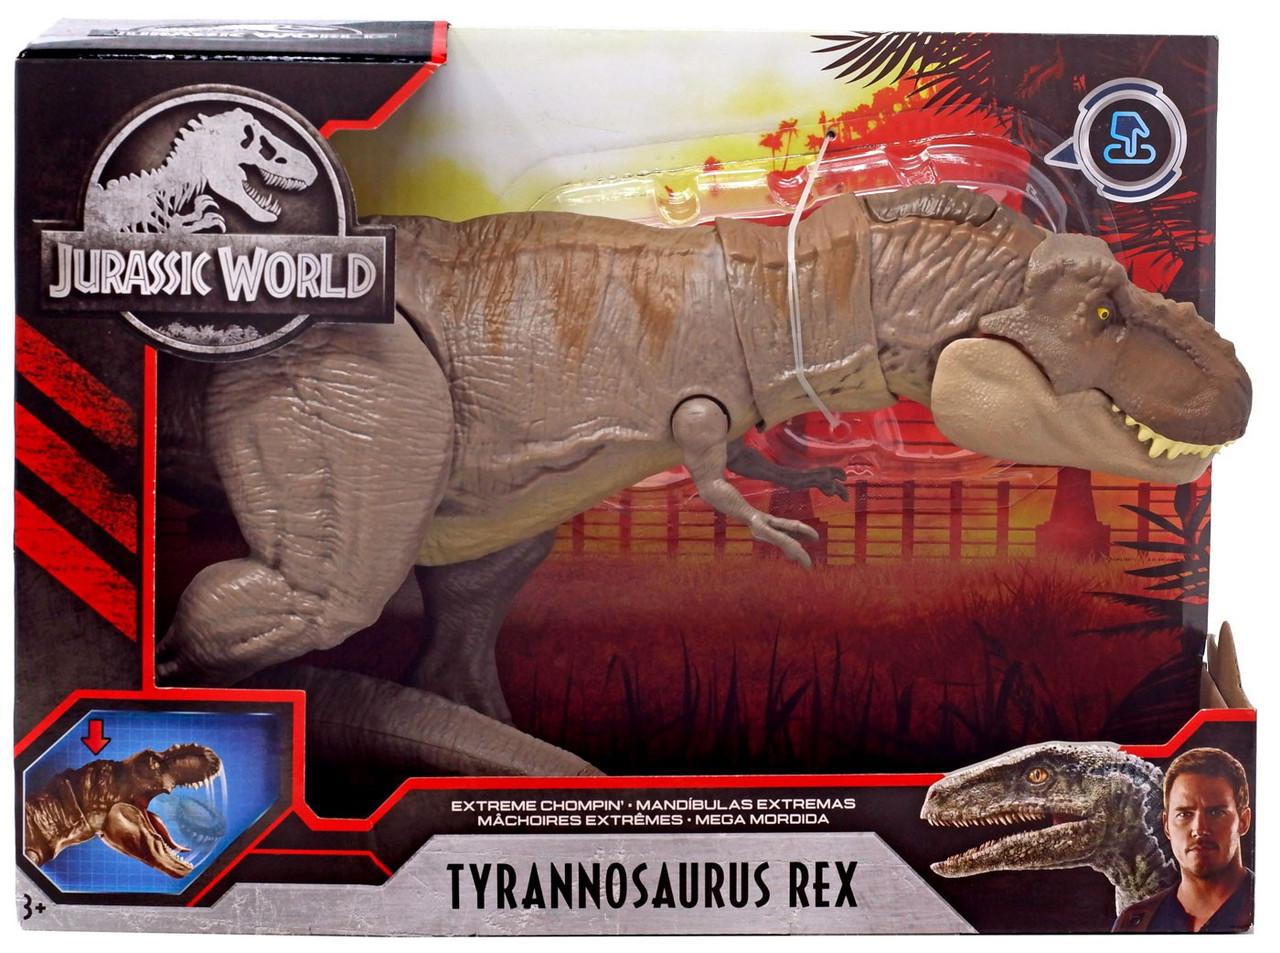 Jurassic World Legacy Collection Extreme Chompin/' Tyrannosaurus Rex Fallen Kingd